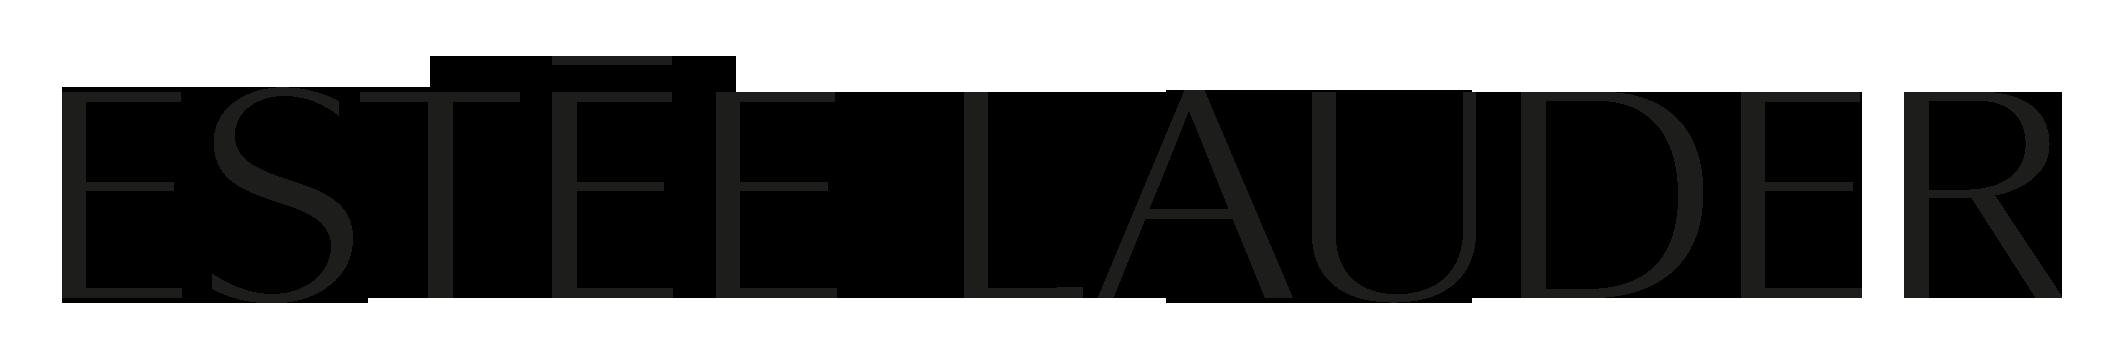 Download Estee Lauder Logo PNG Image for Free.